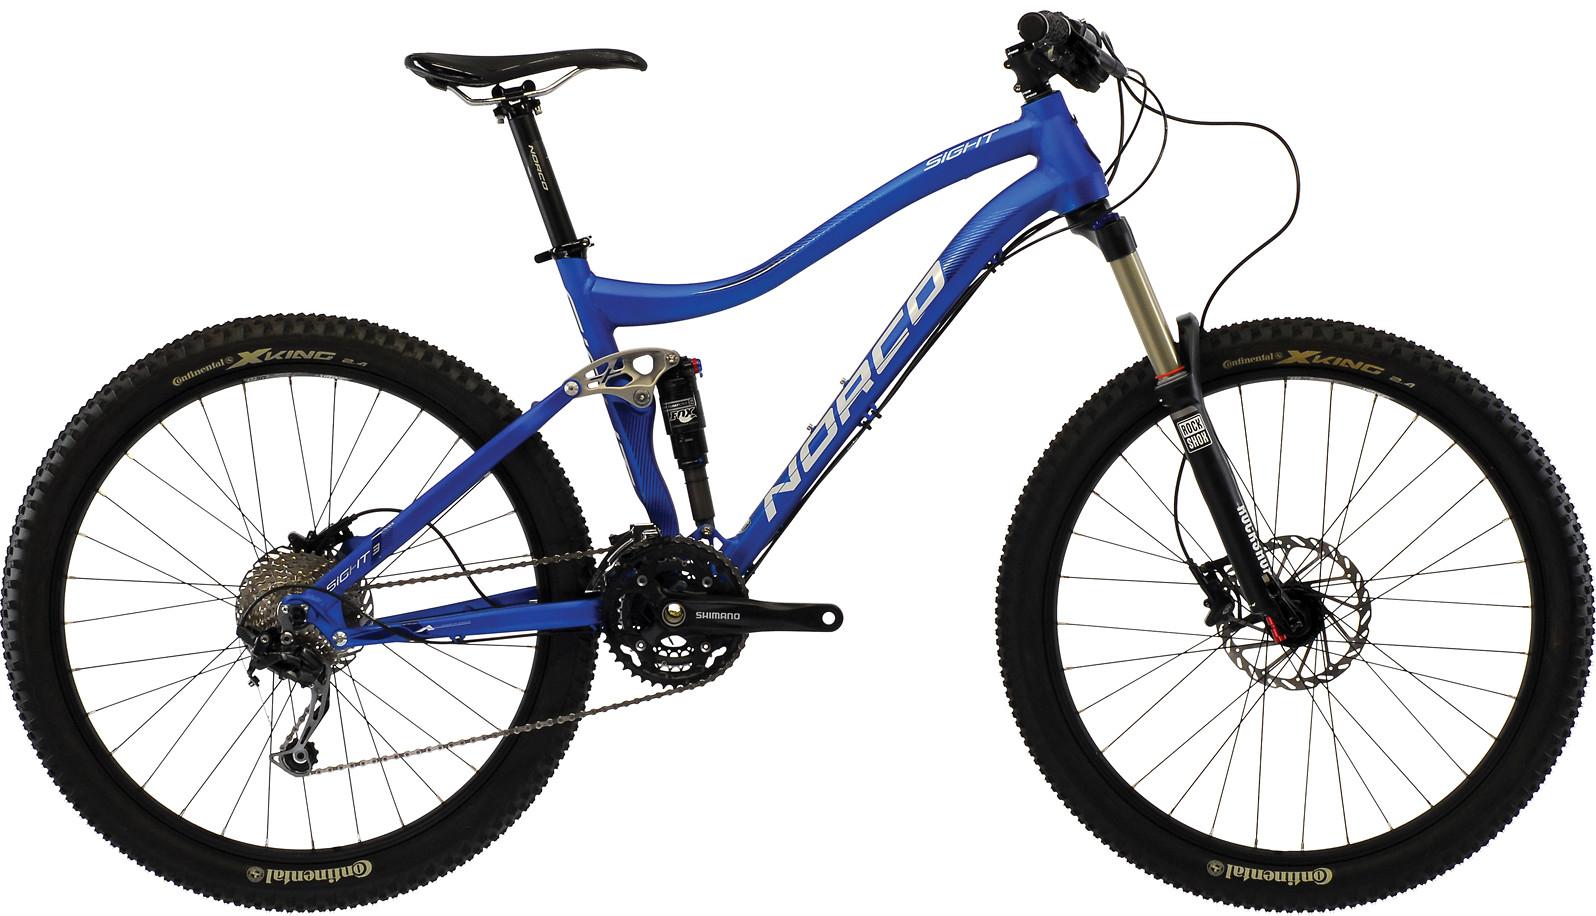 2013 Norco Sight 3 Bike 064430-13-02-sight3-blue